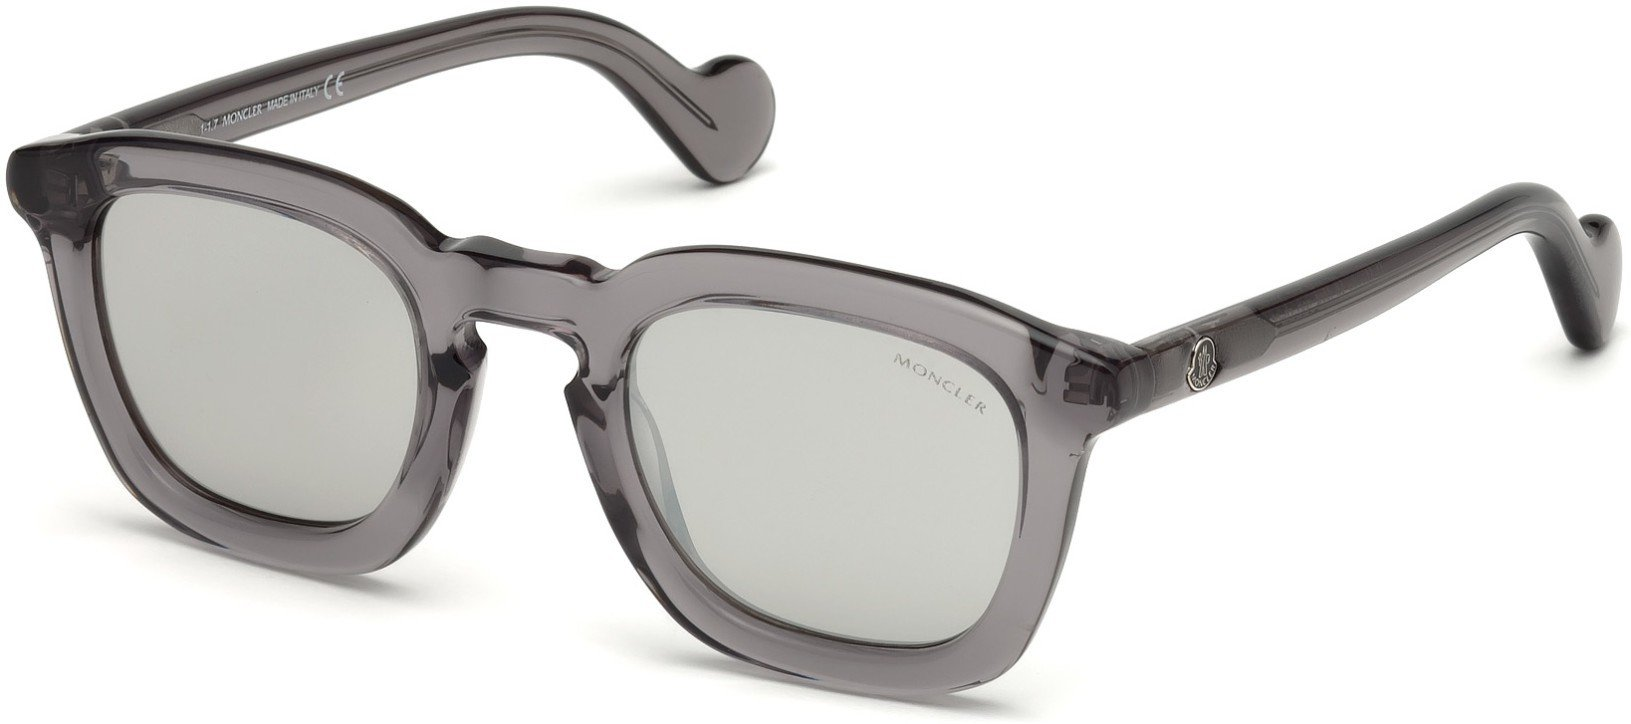 Sunglasses Moncler ML 0006 Mr 20C Shiny Transparent Grey/Smoke W. Silver Mirro